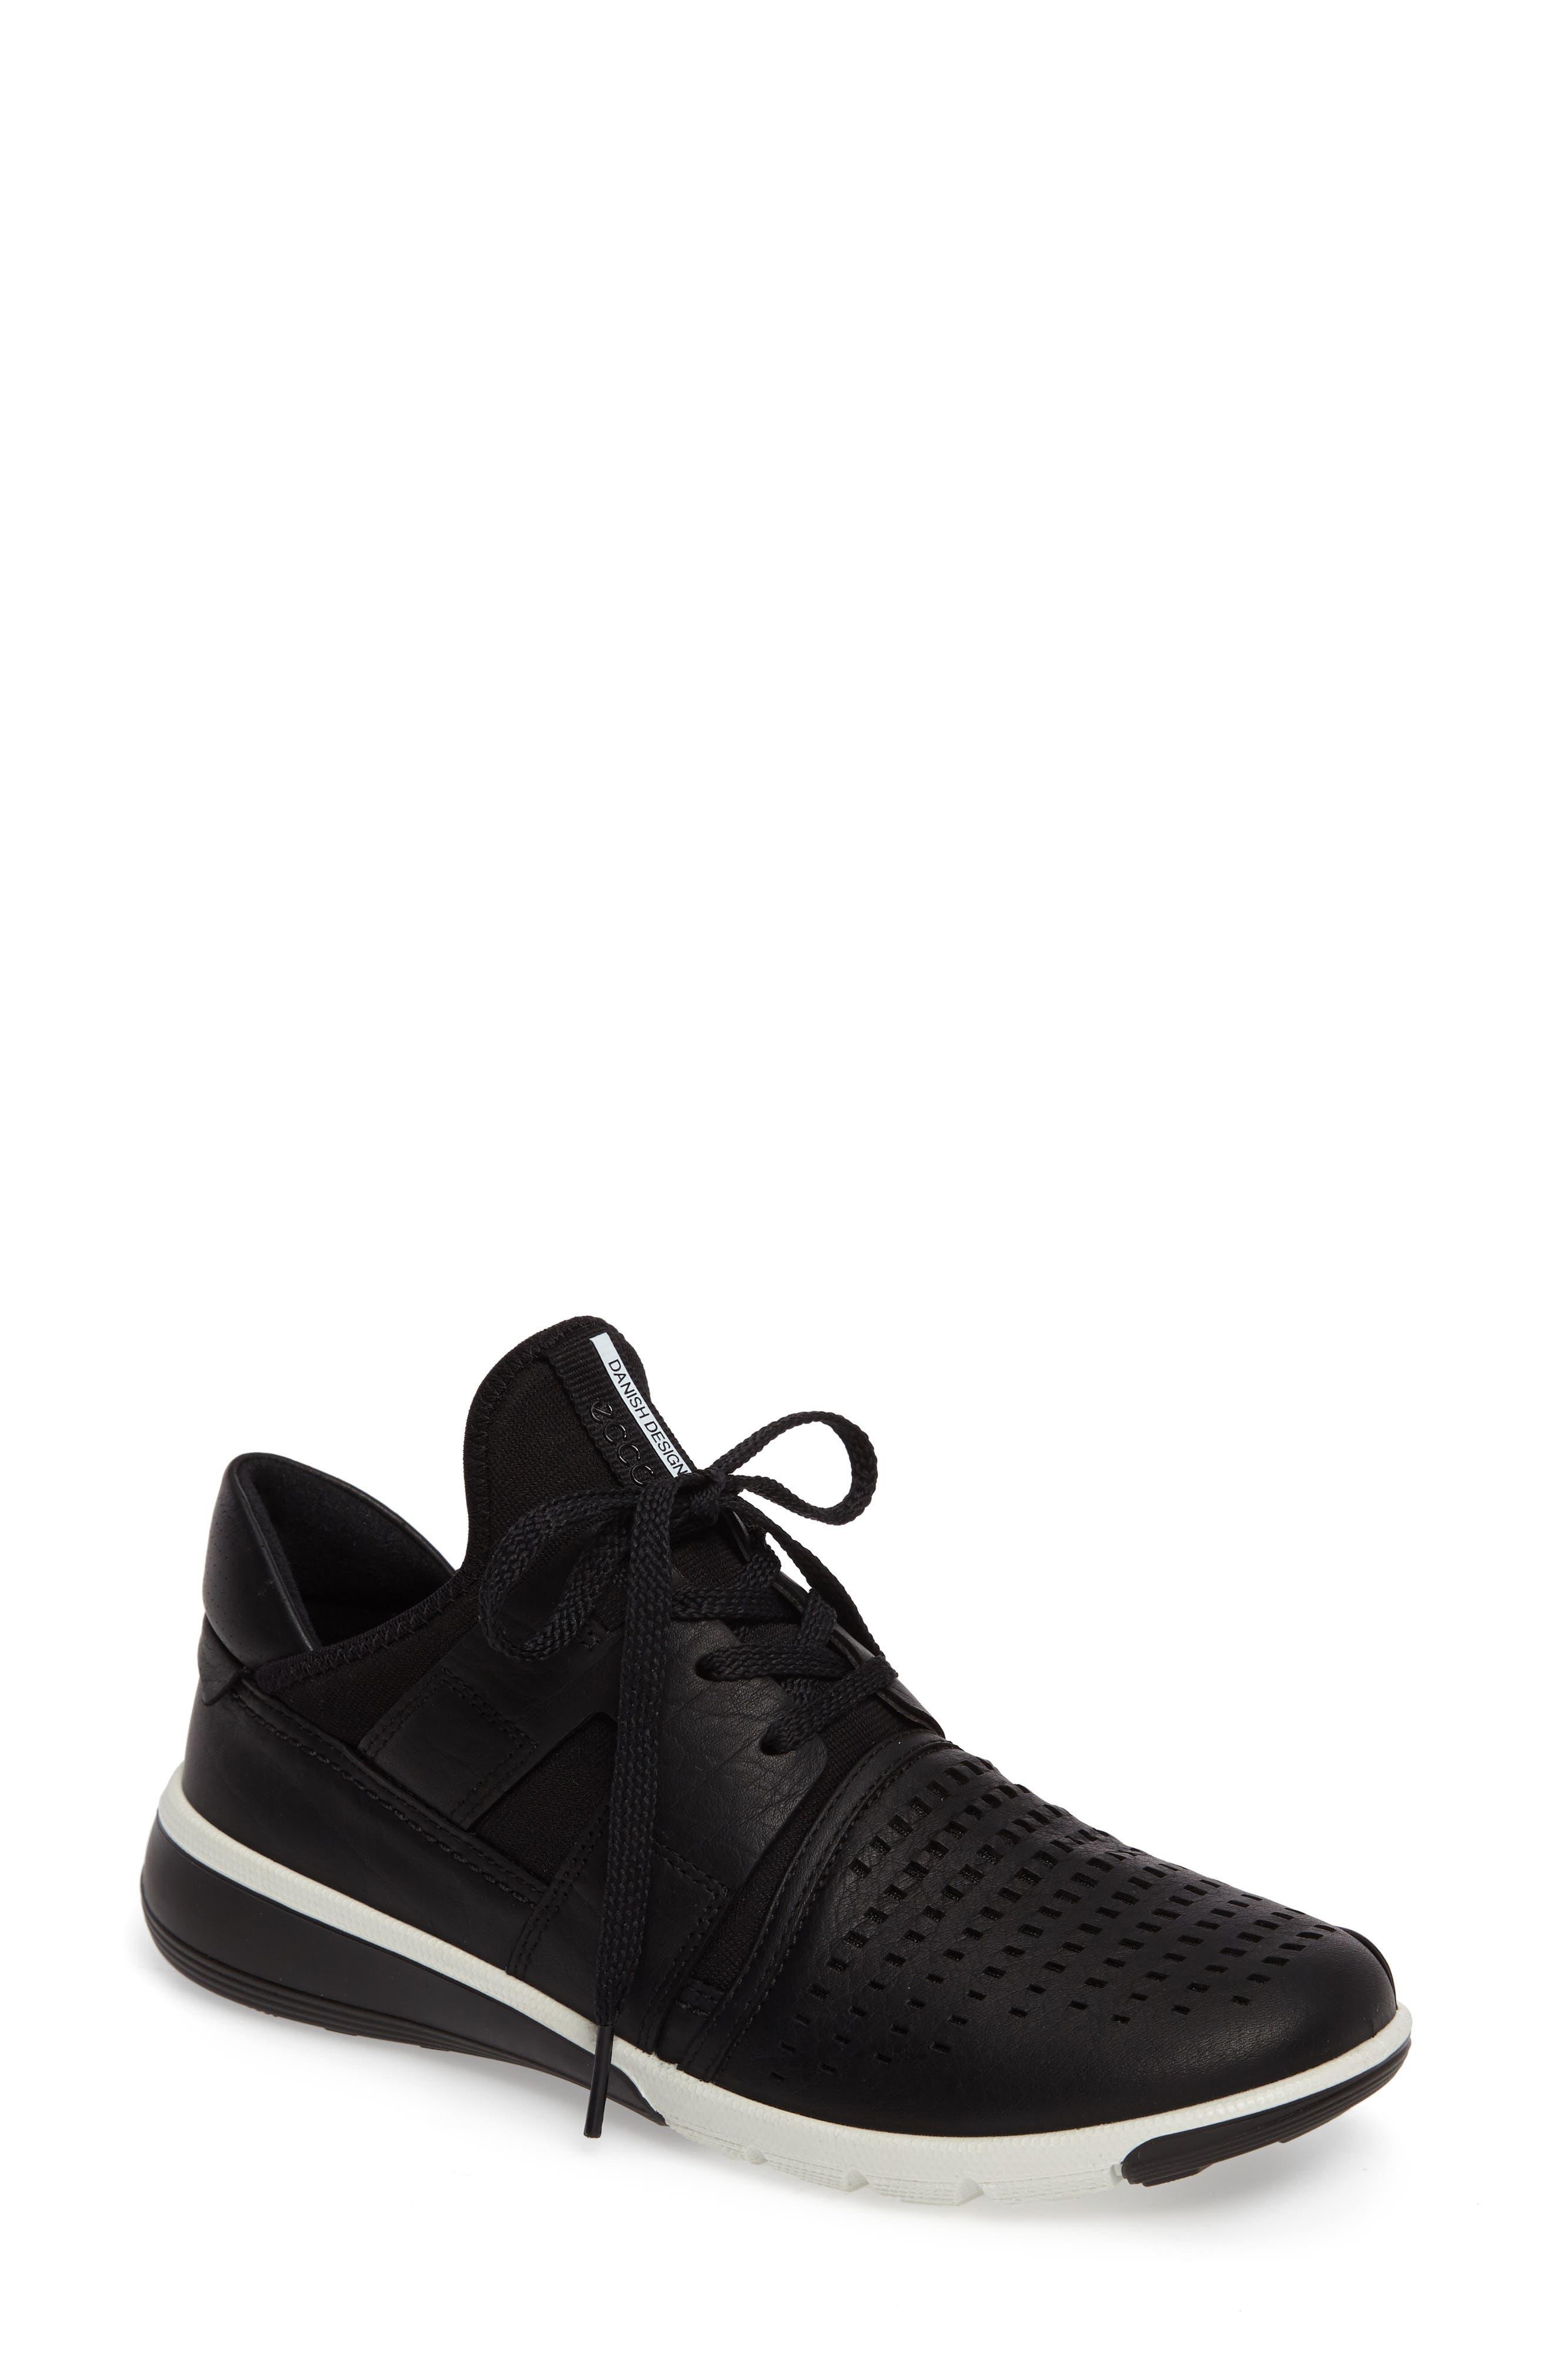 Alternate Image 1 Selected - ECCO Intrinsic 2 Sneaker (Women)